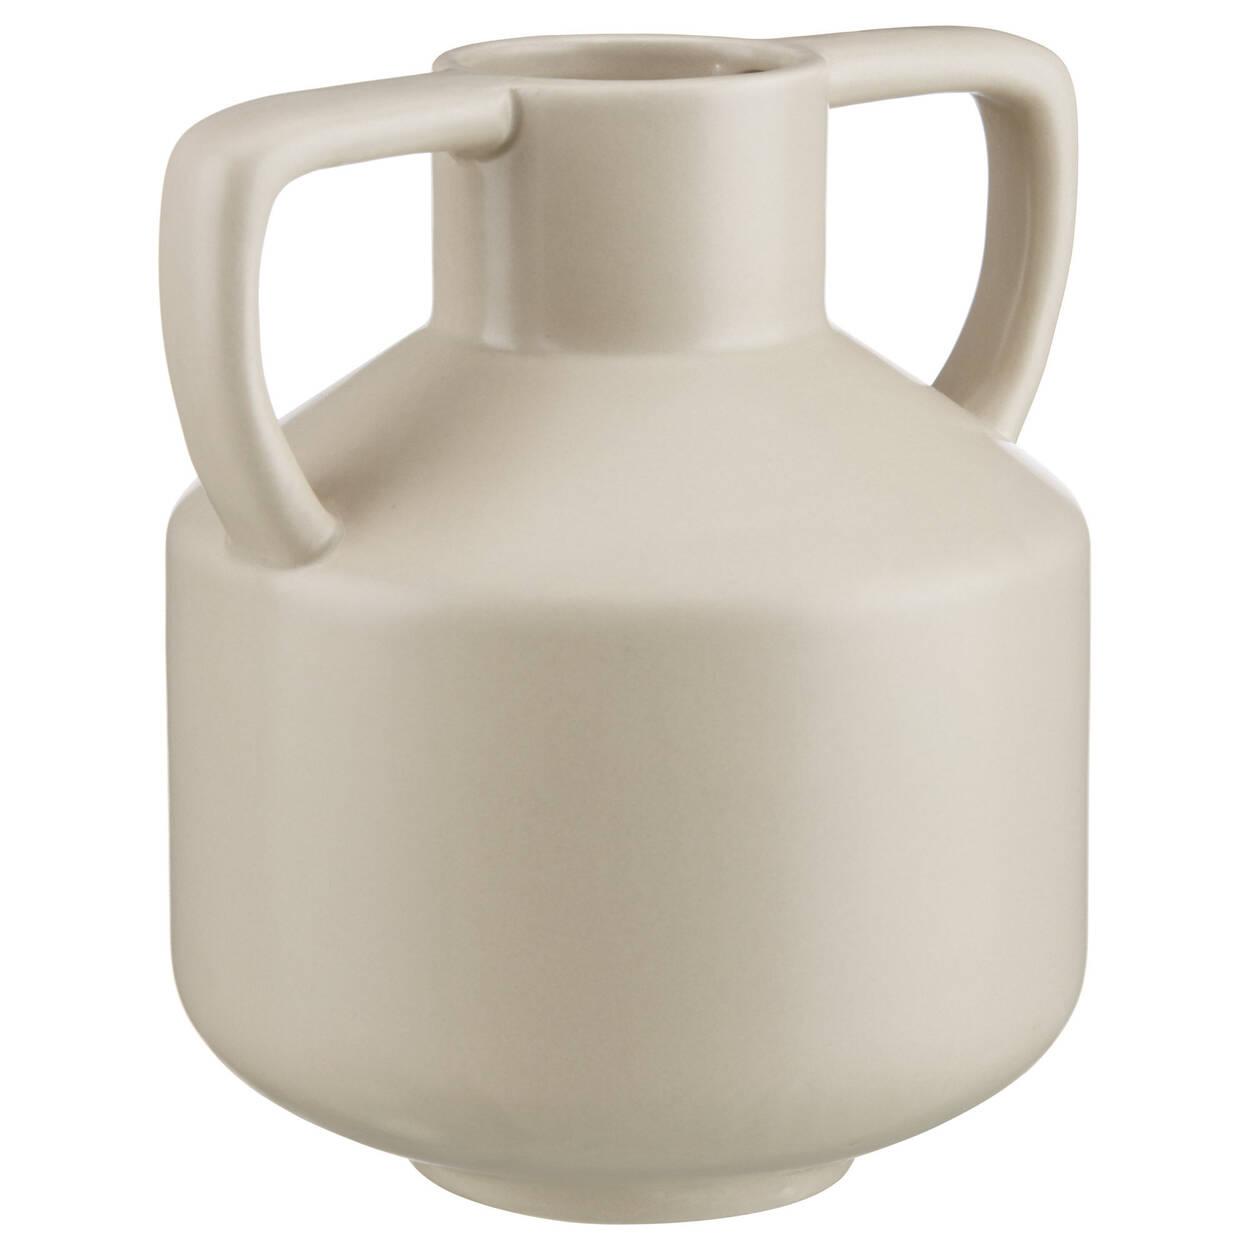 Beige Vase with Angular Handles